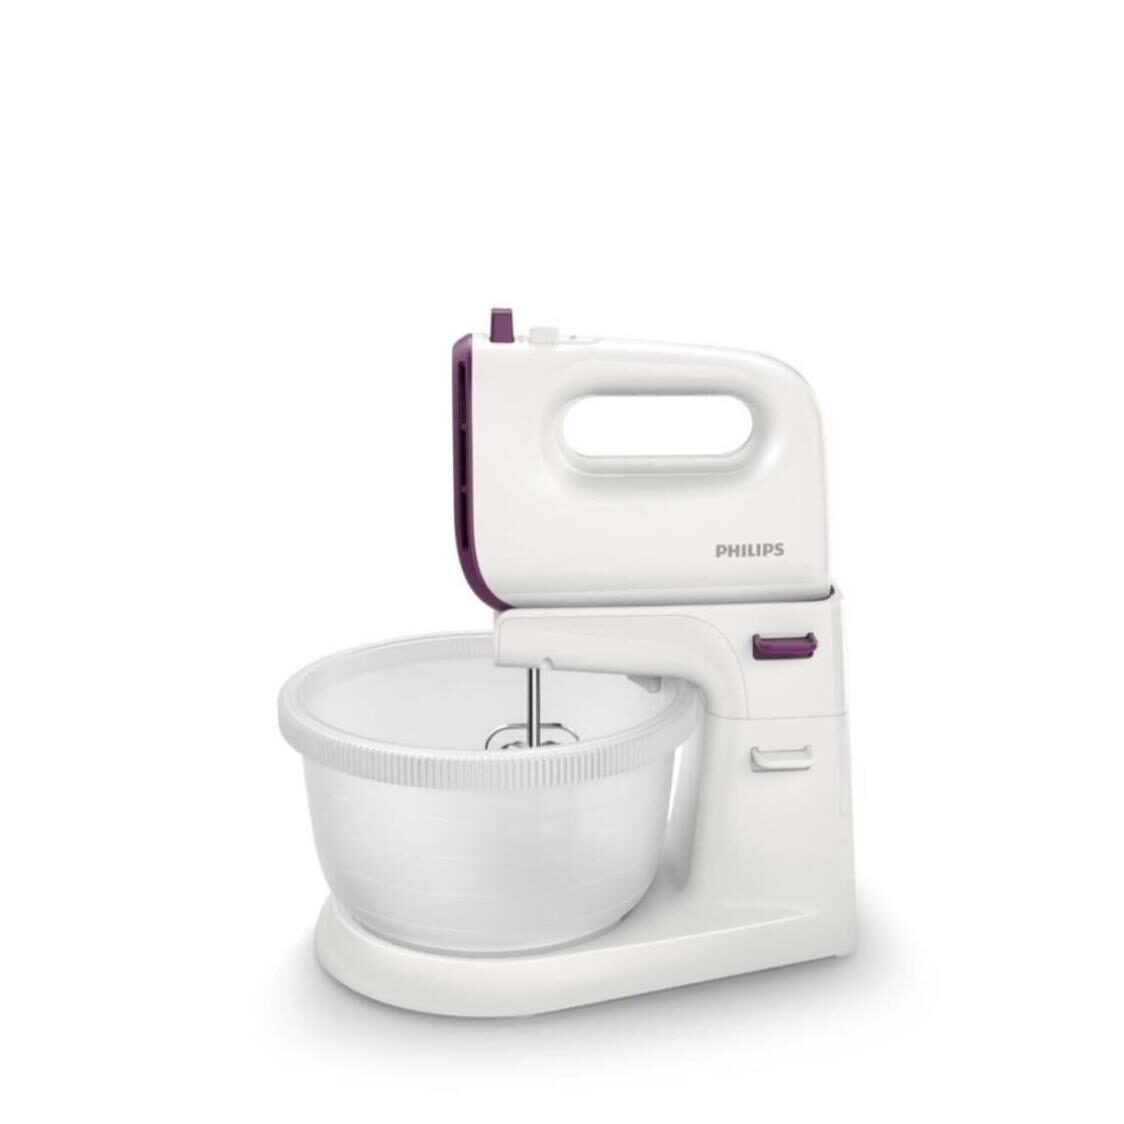 Philips Viva Collection 450W Kitchen Mixer HR374511